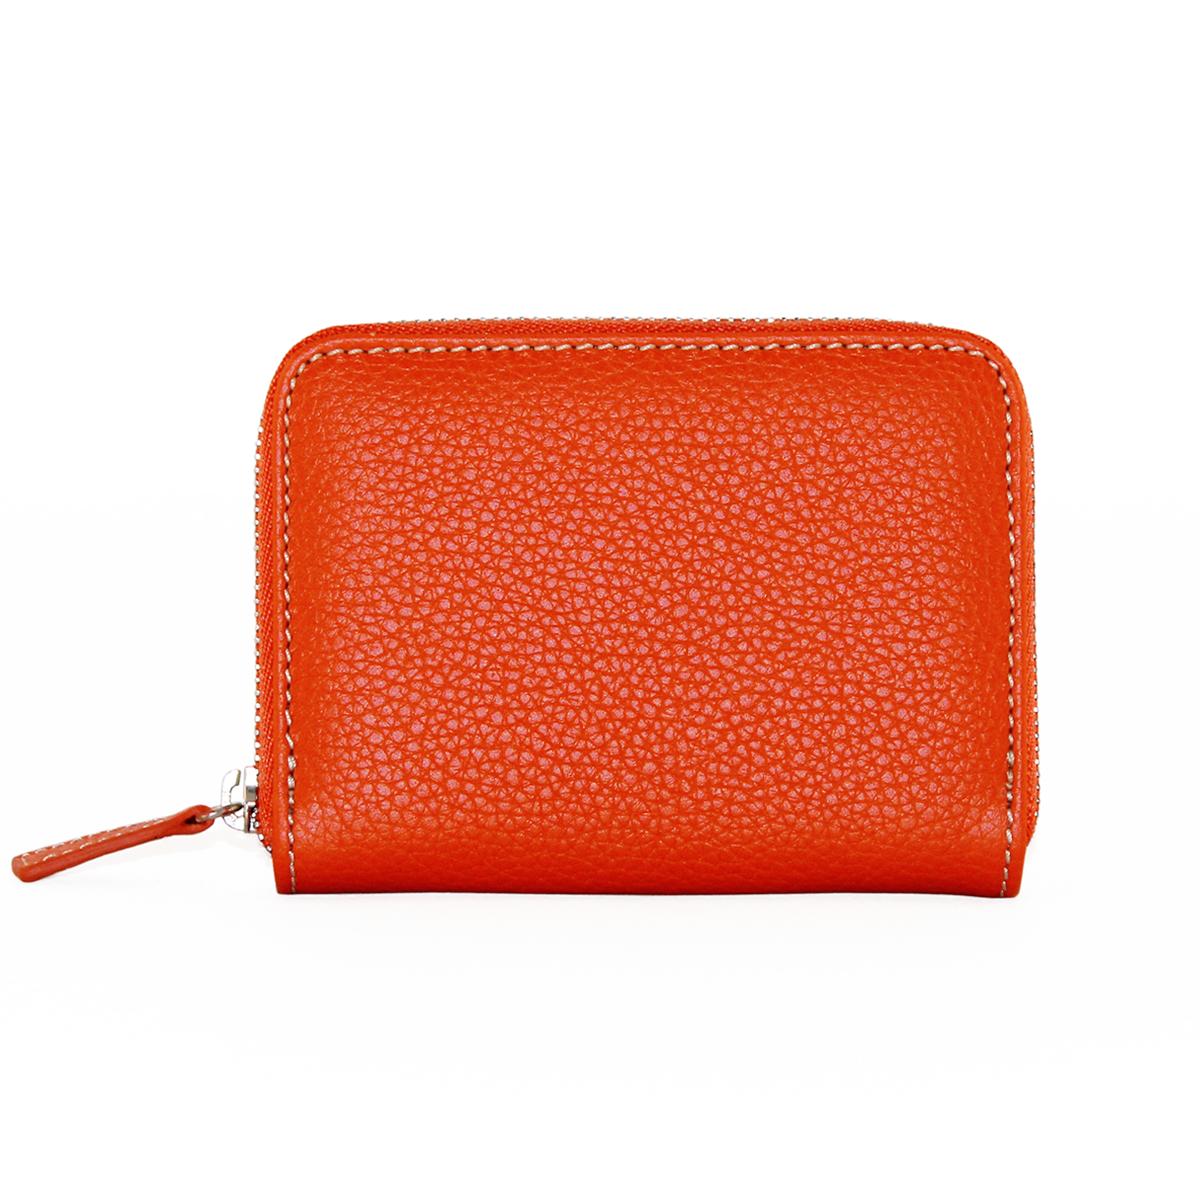 New Wallet Orange